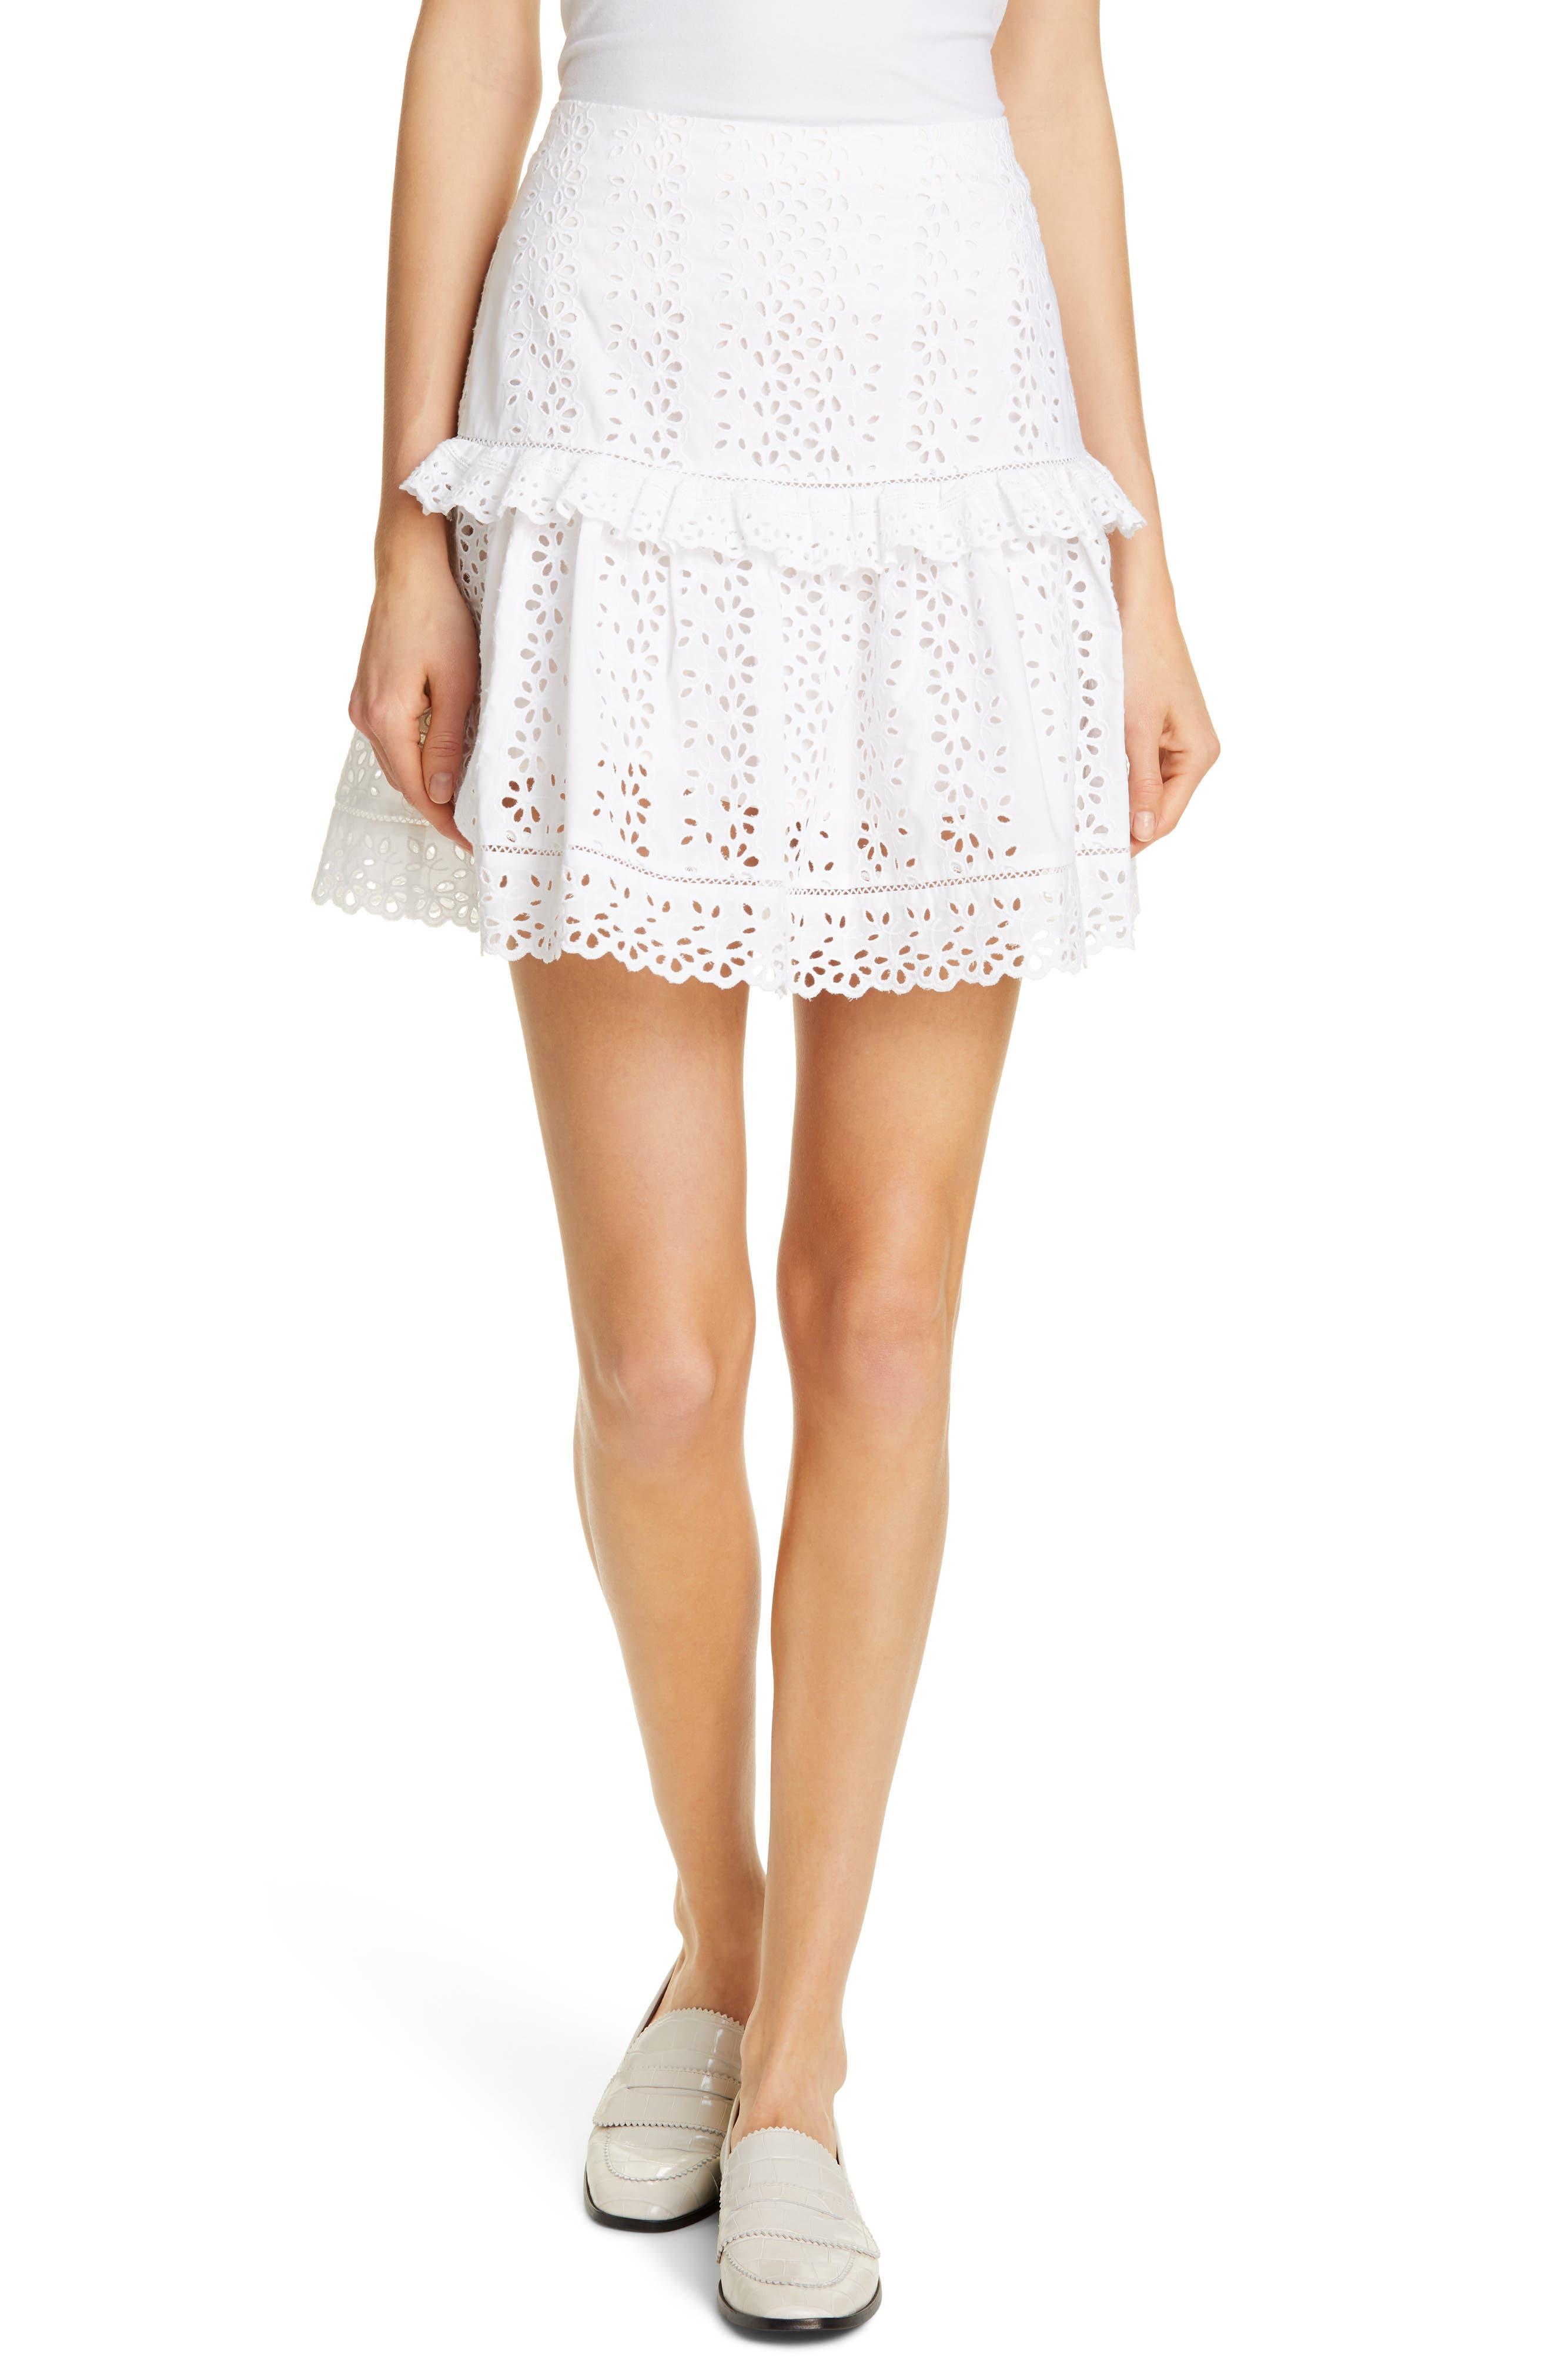 REBECCA TAYLOR Karina Cotton Eyelet Skirt, Main, color, MILK